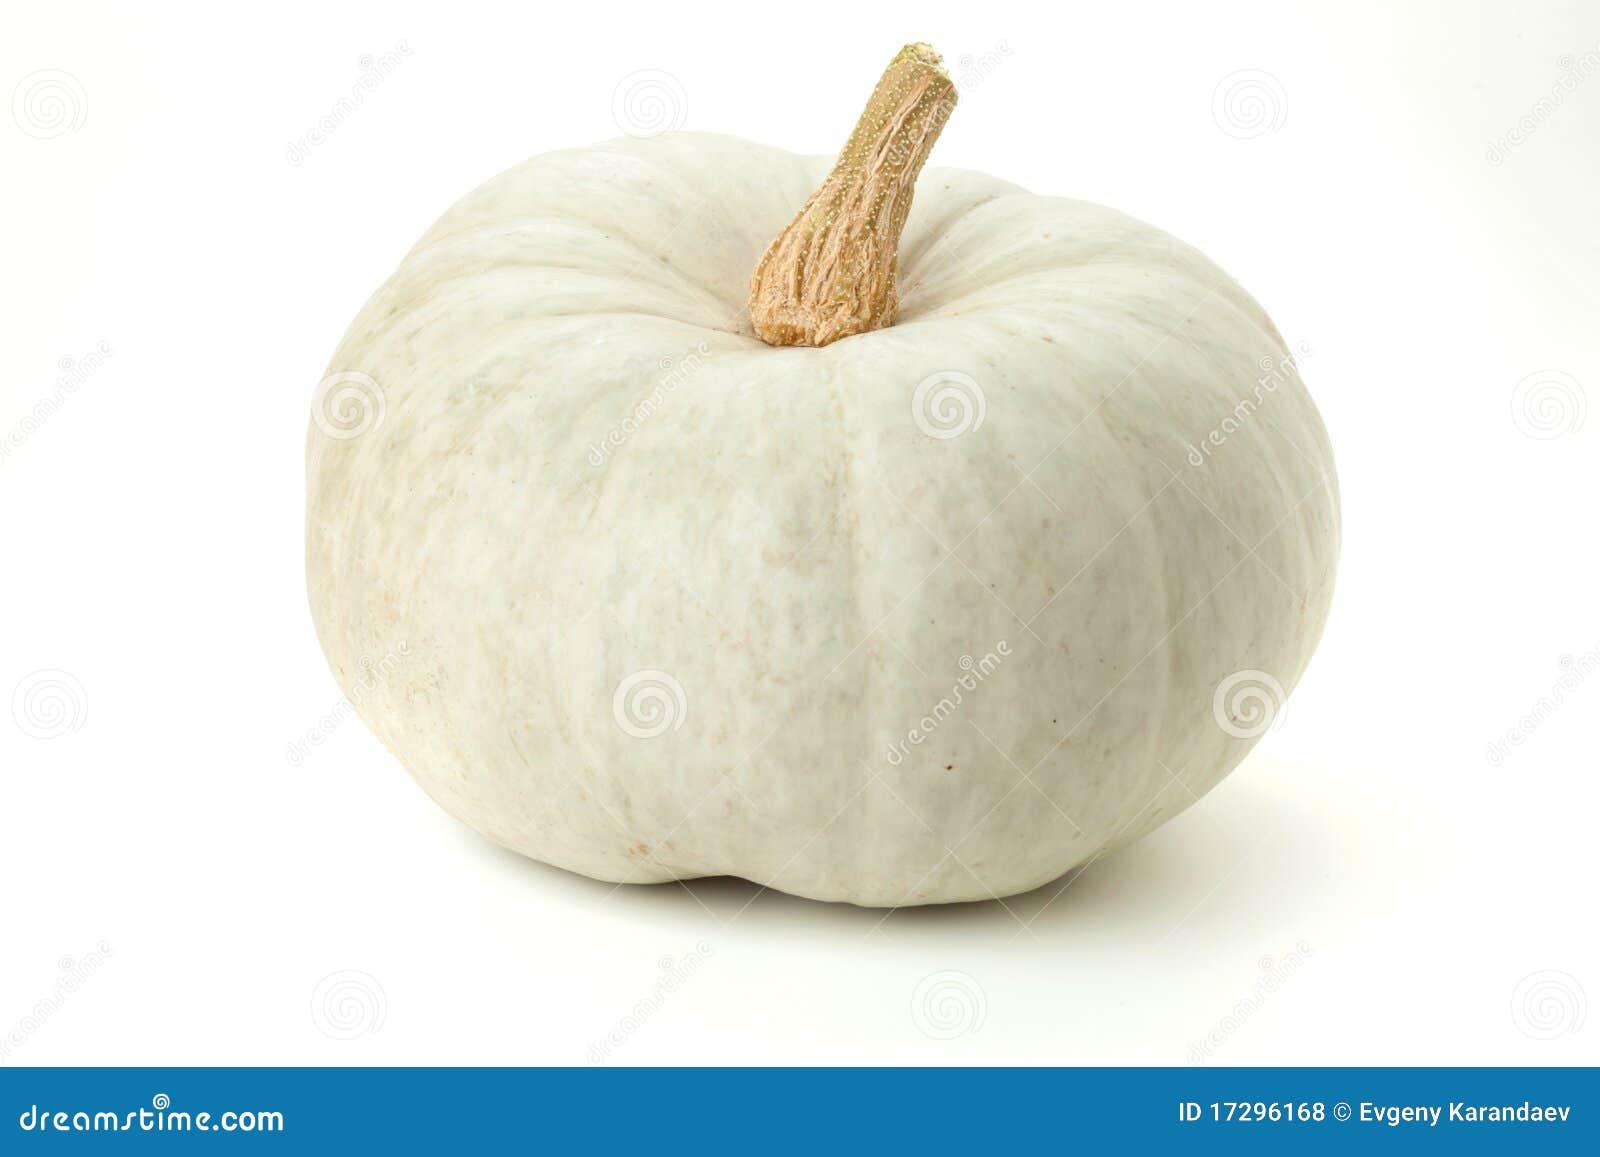 Decorative White Pumpkins